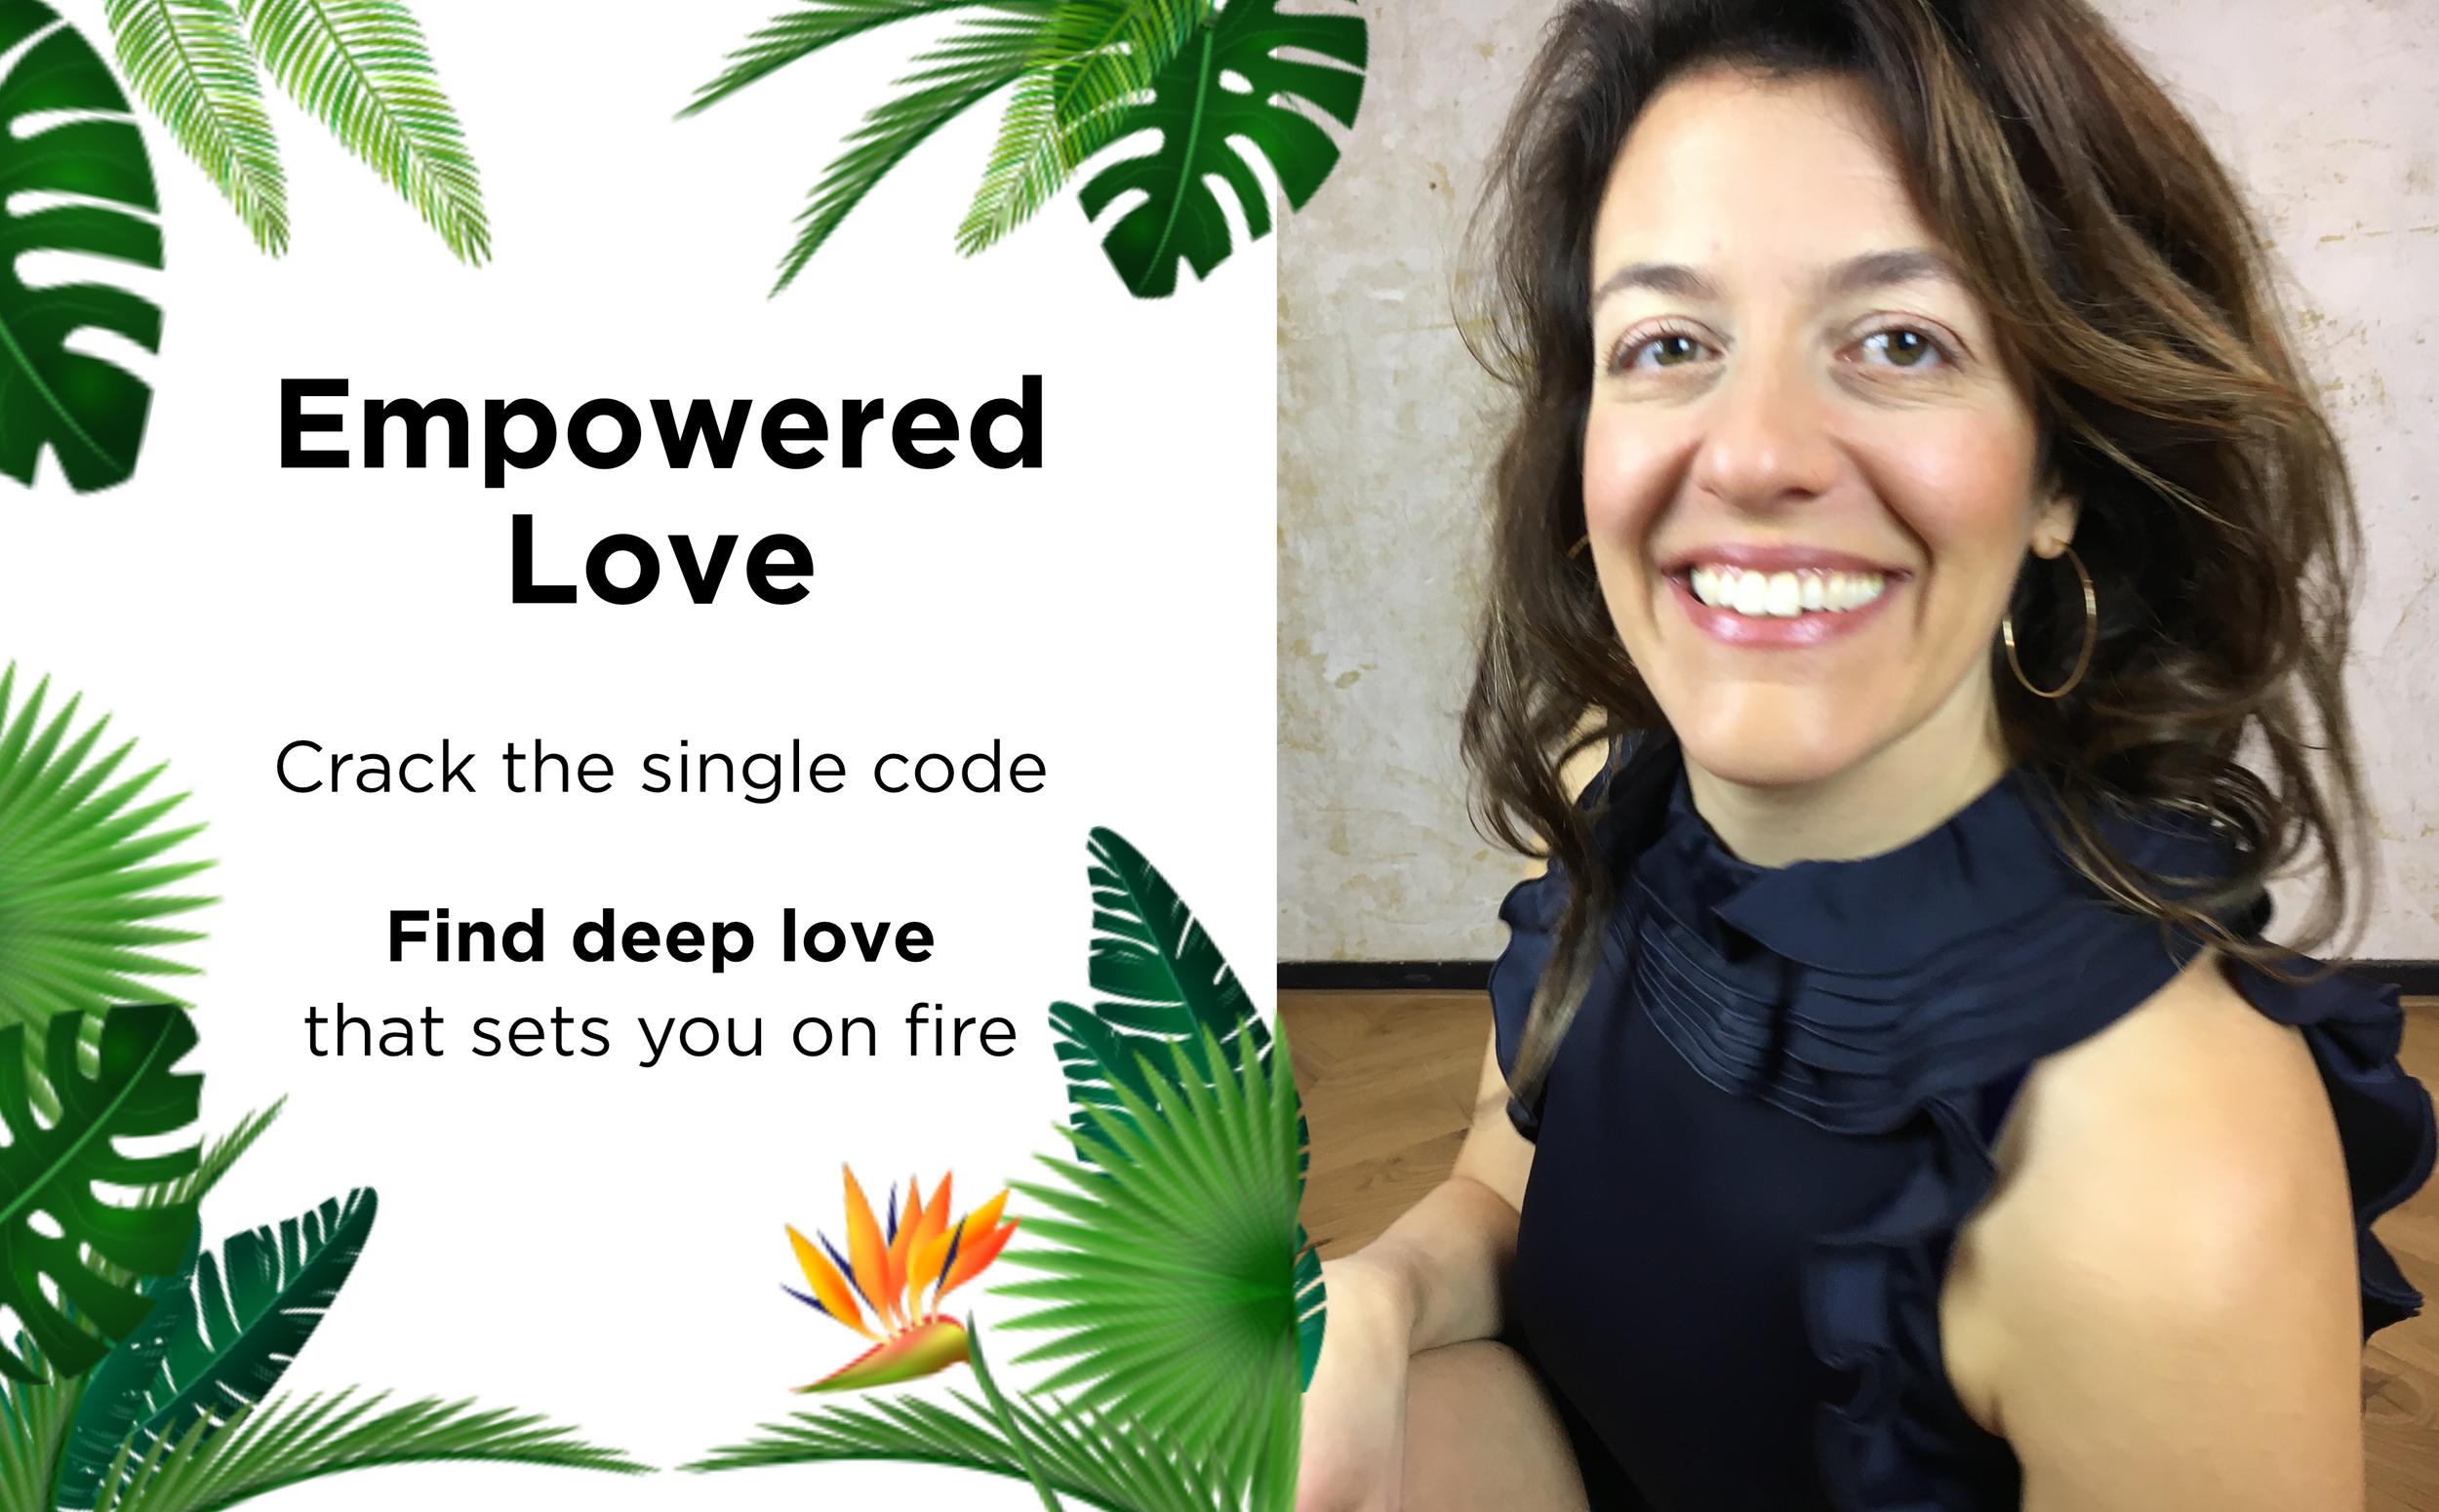 Empowered-Love-Header.png